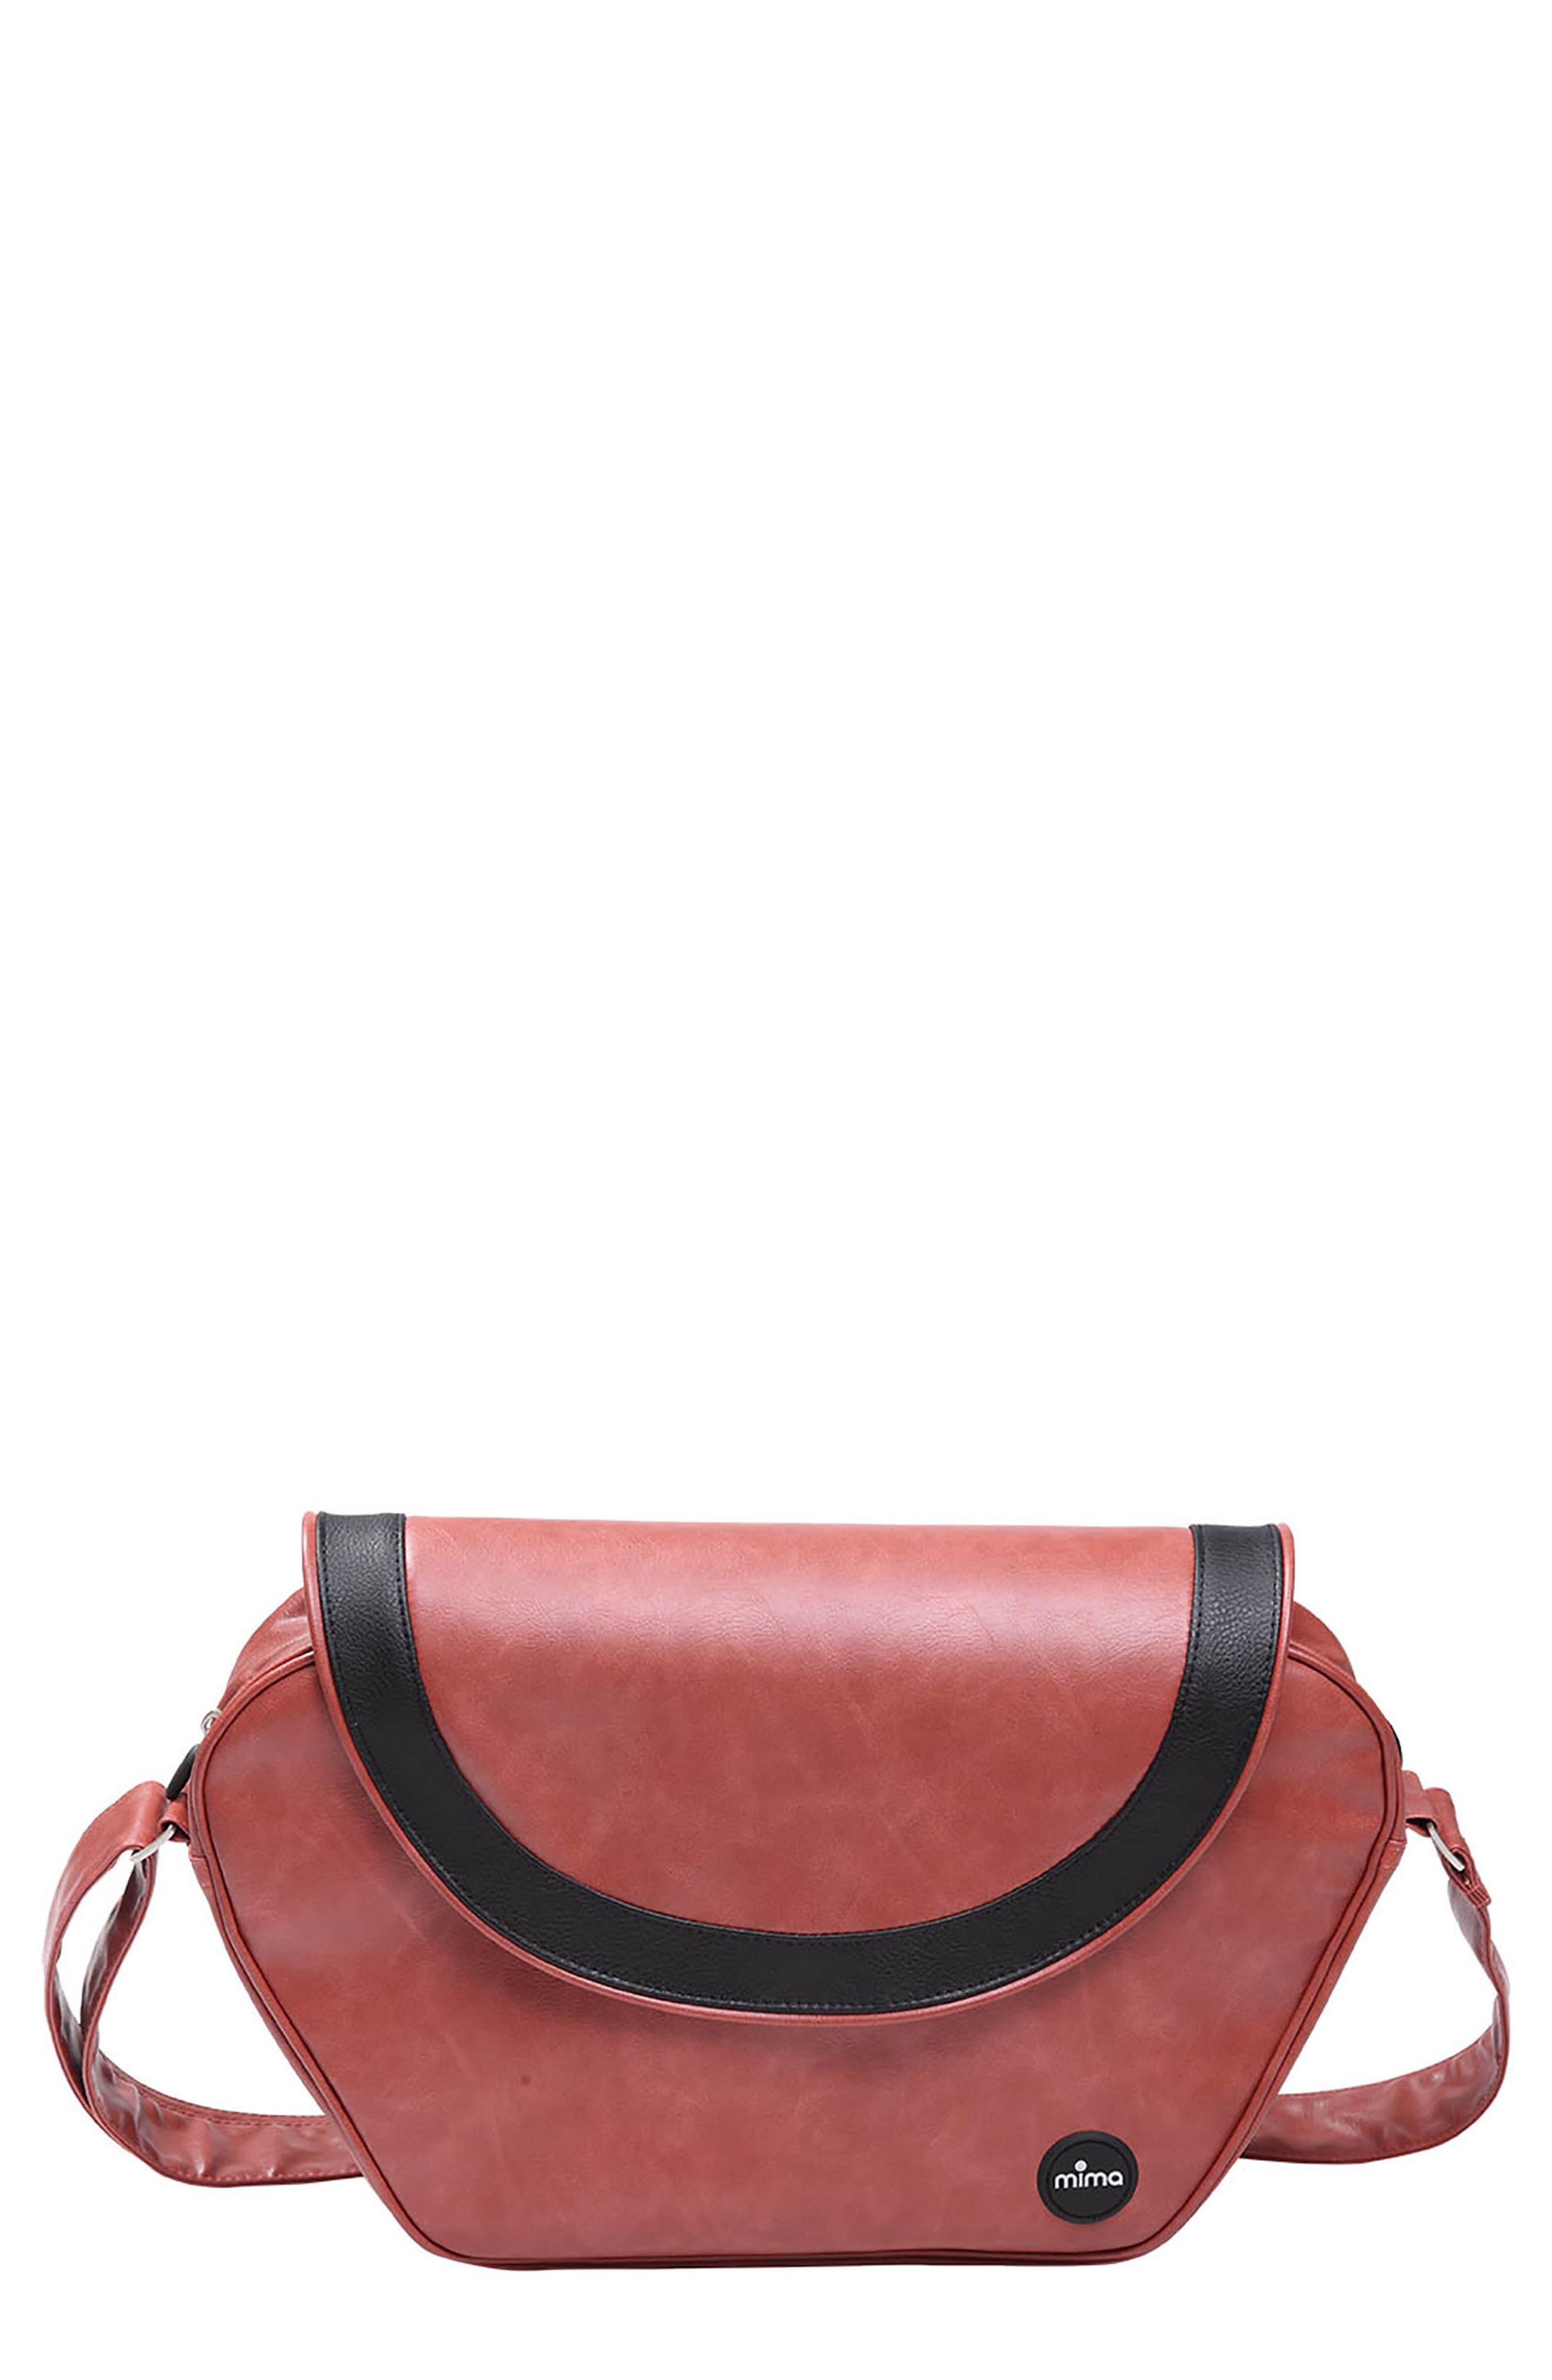 Main Image - Mima Trendy Faux Leather Diaper Bag